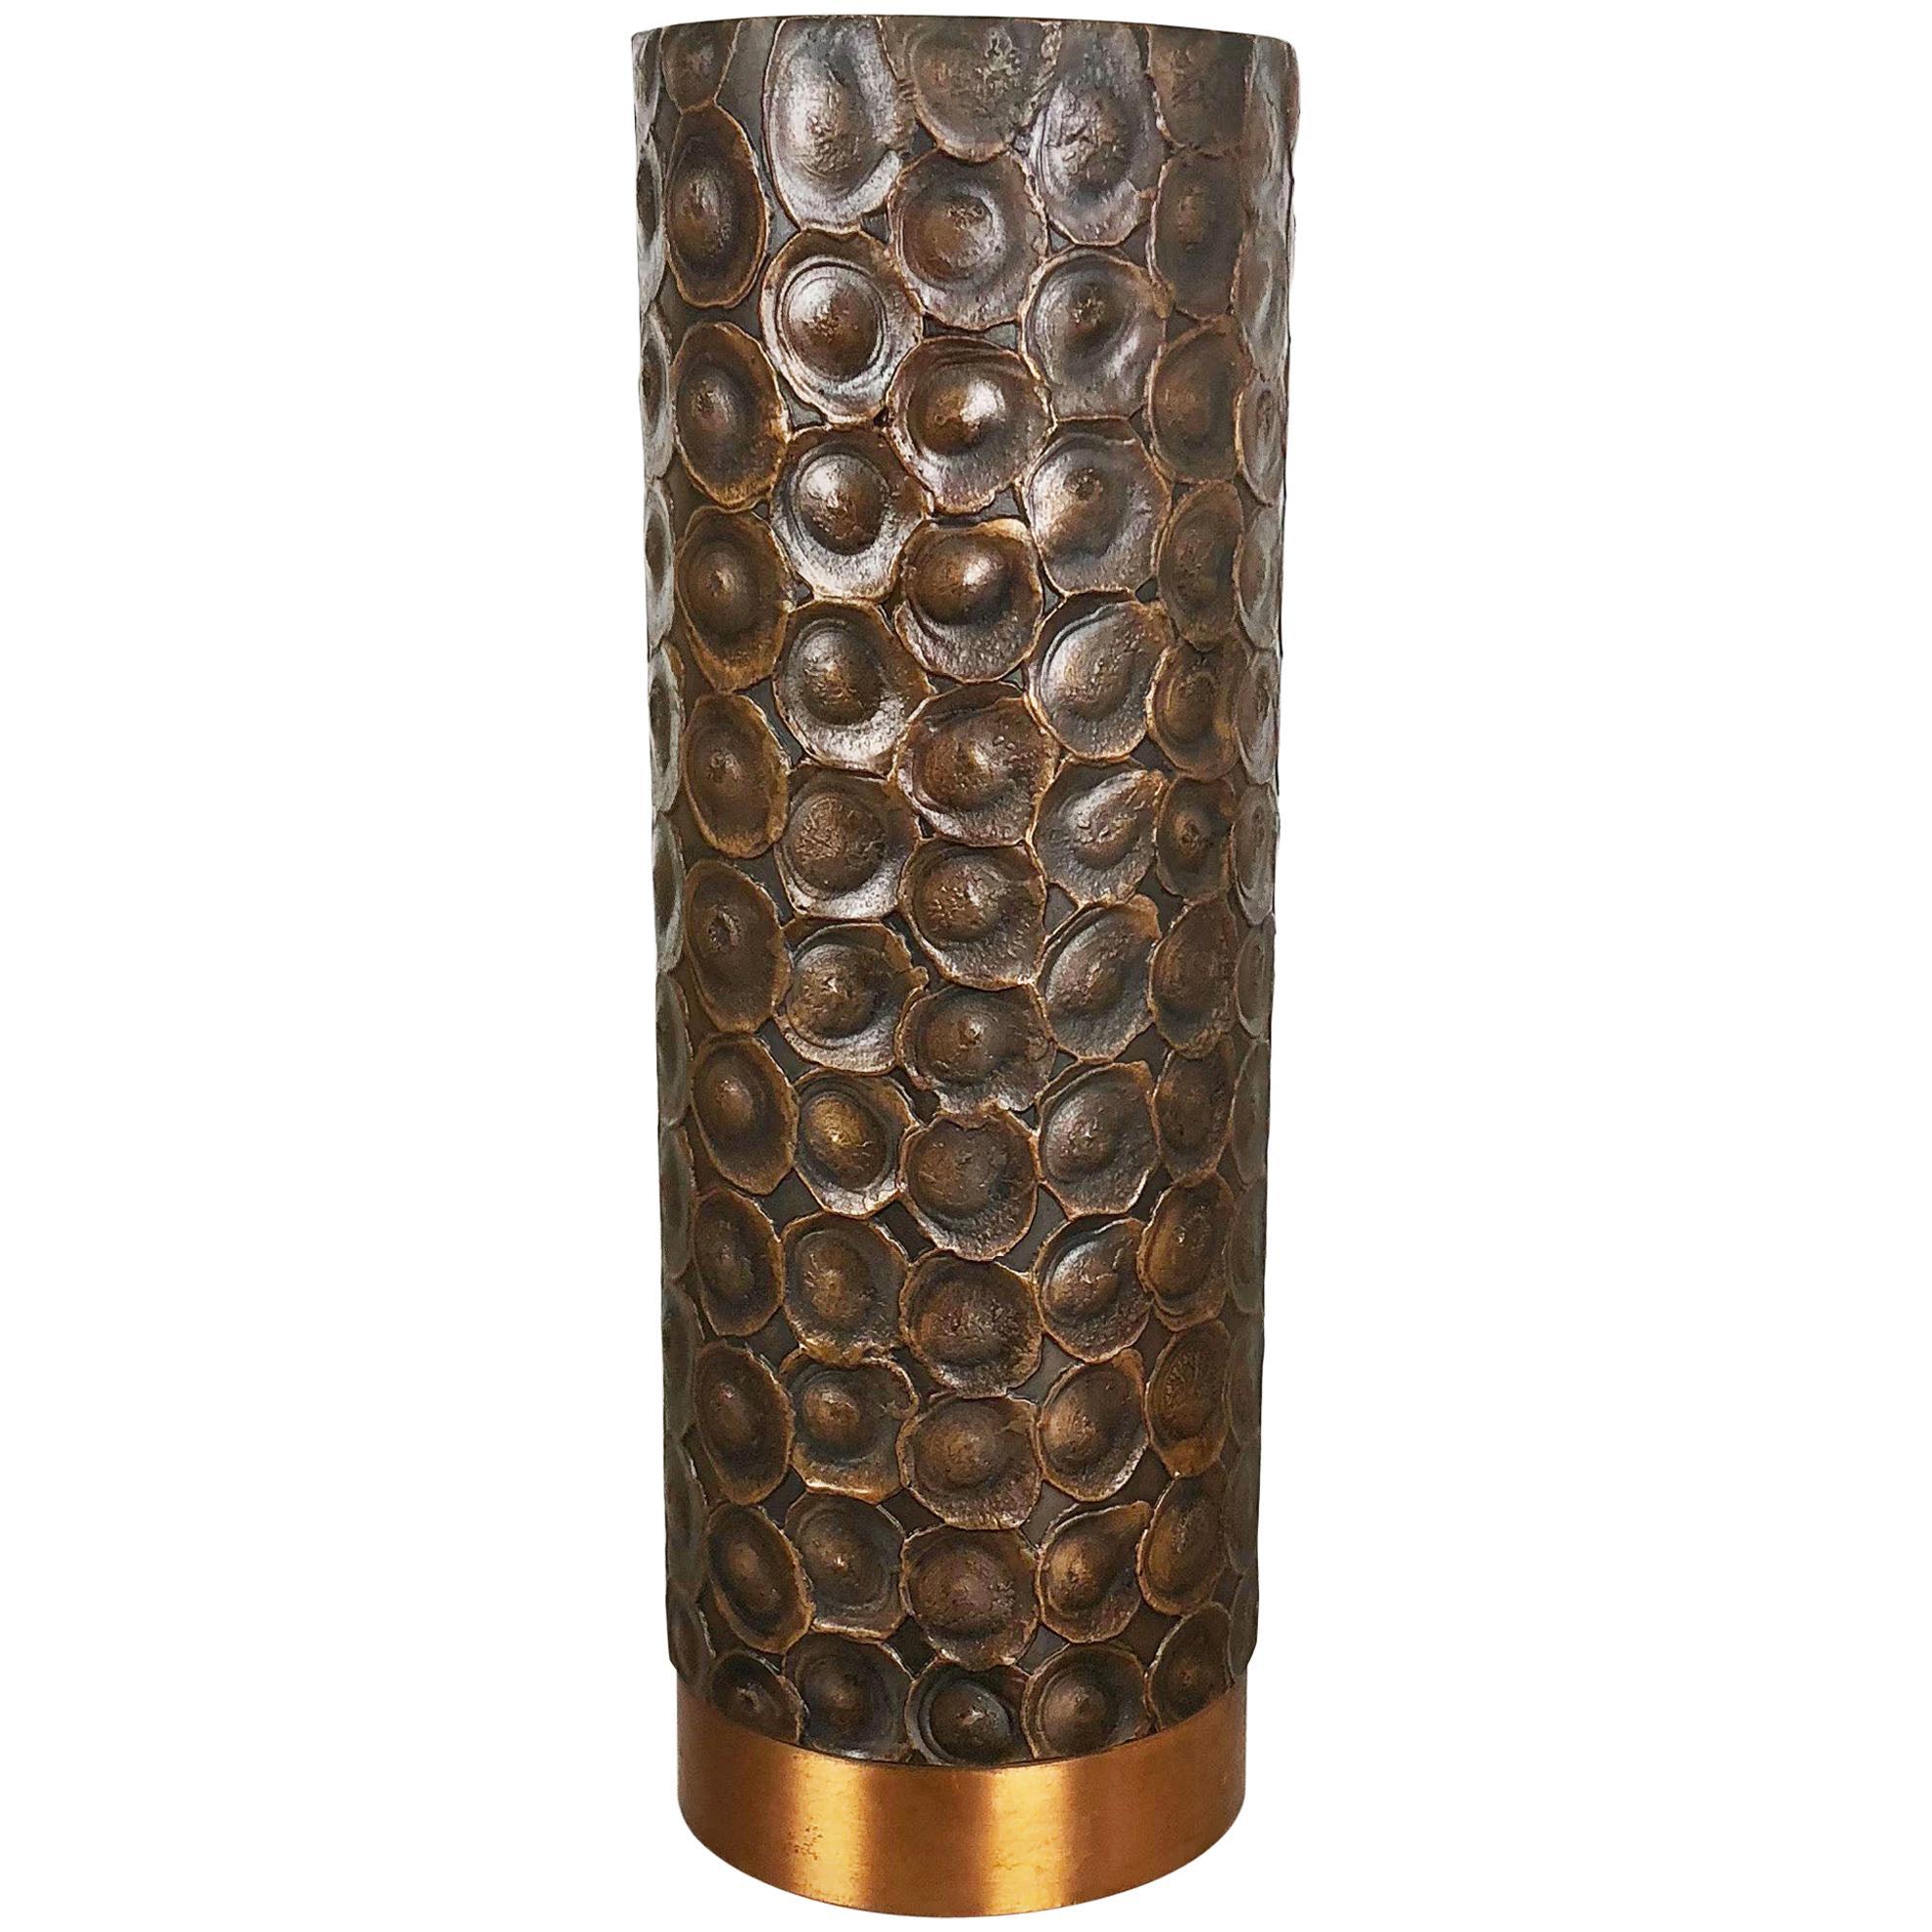 Modernist Sculptural Brutalist Copper Vase Auböck Style, Austria, 1950s